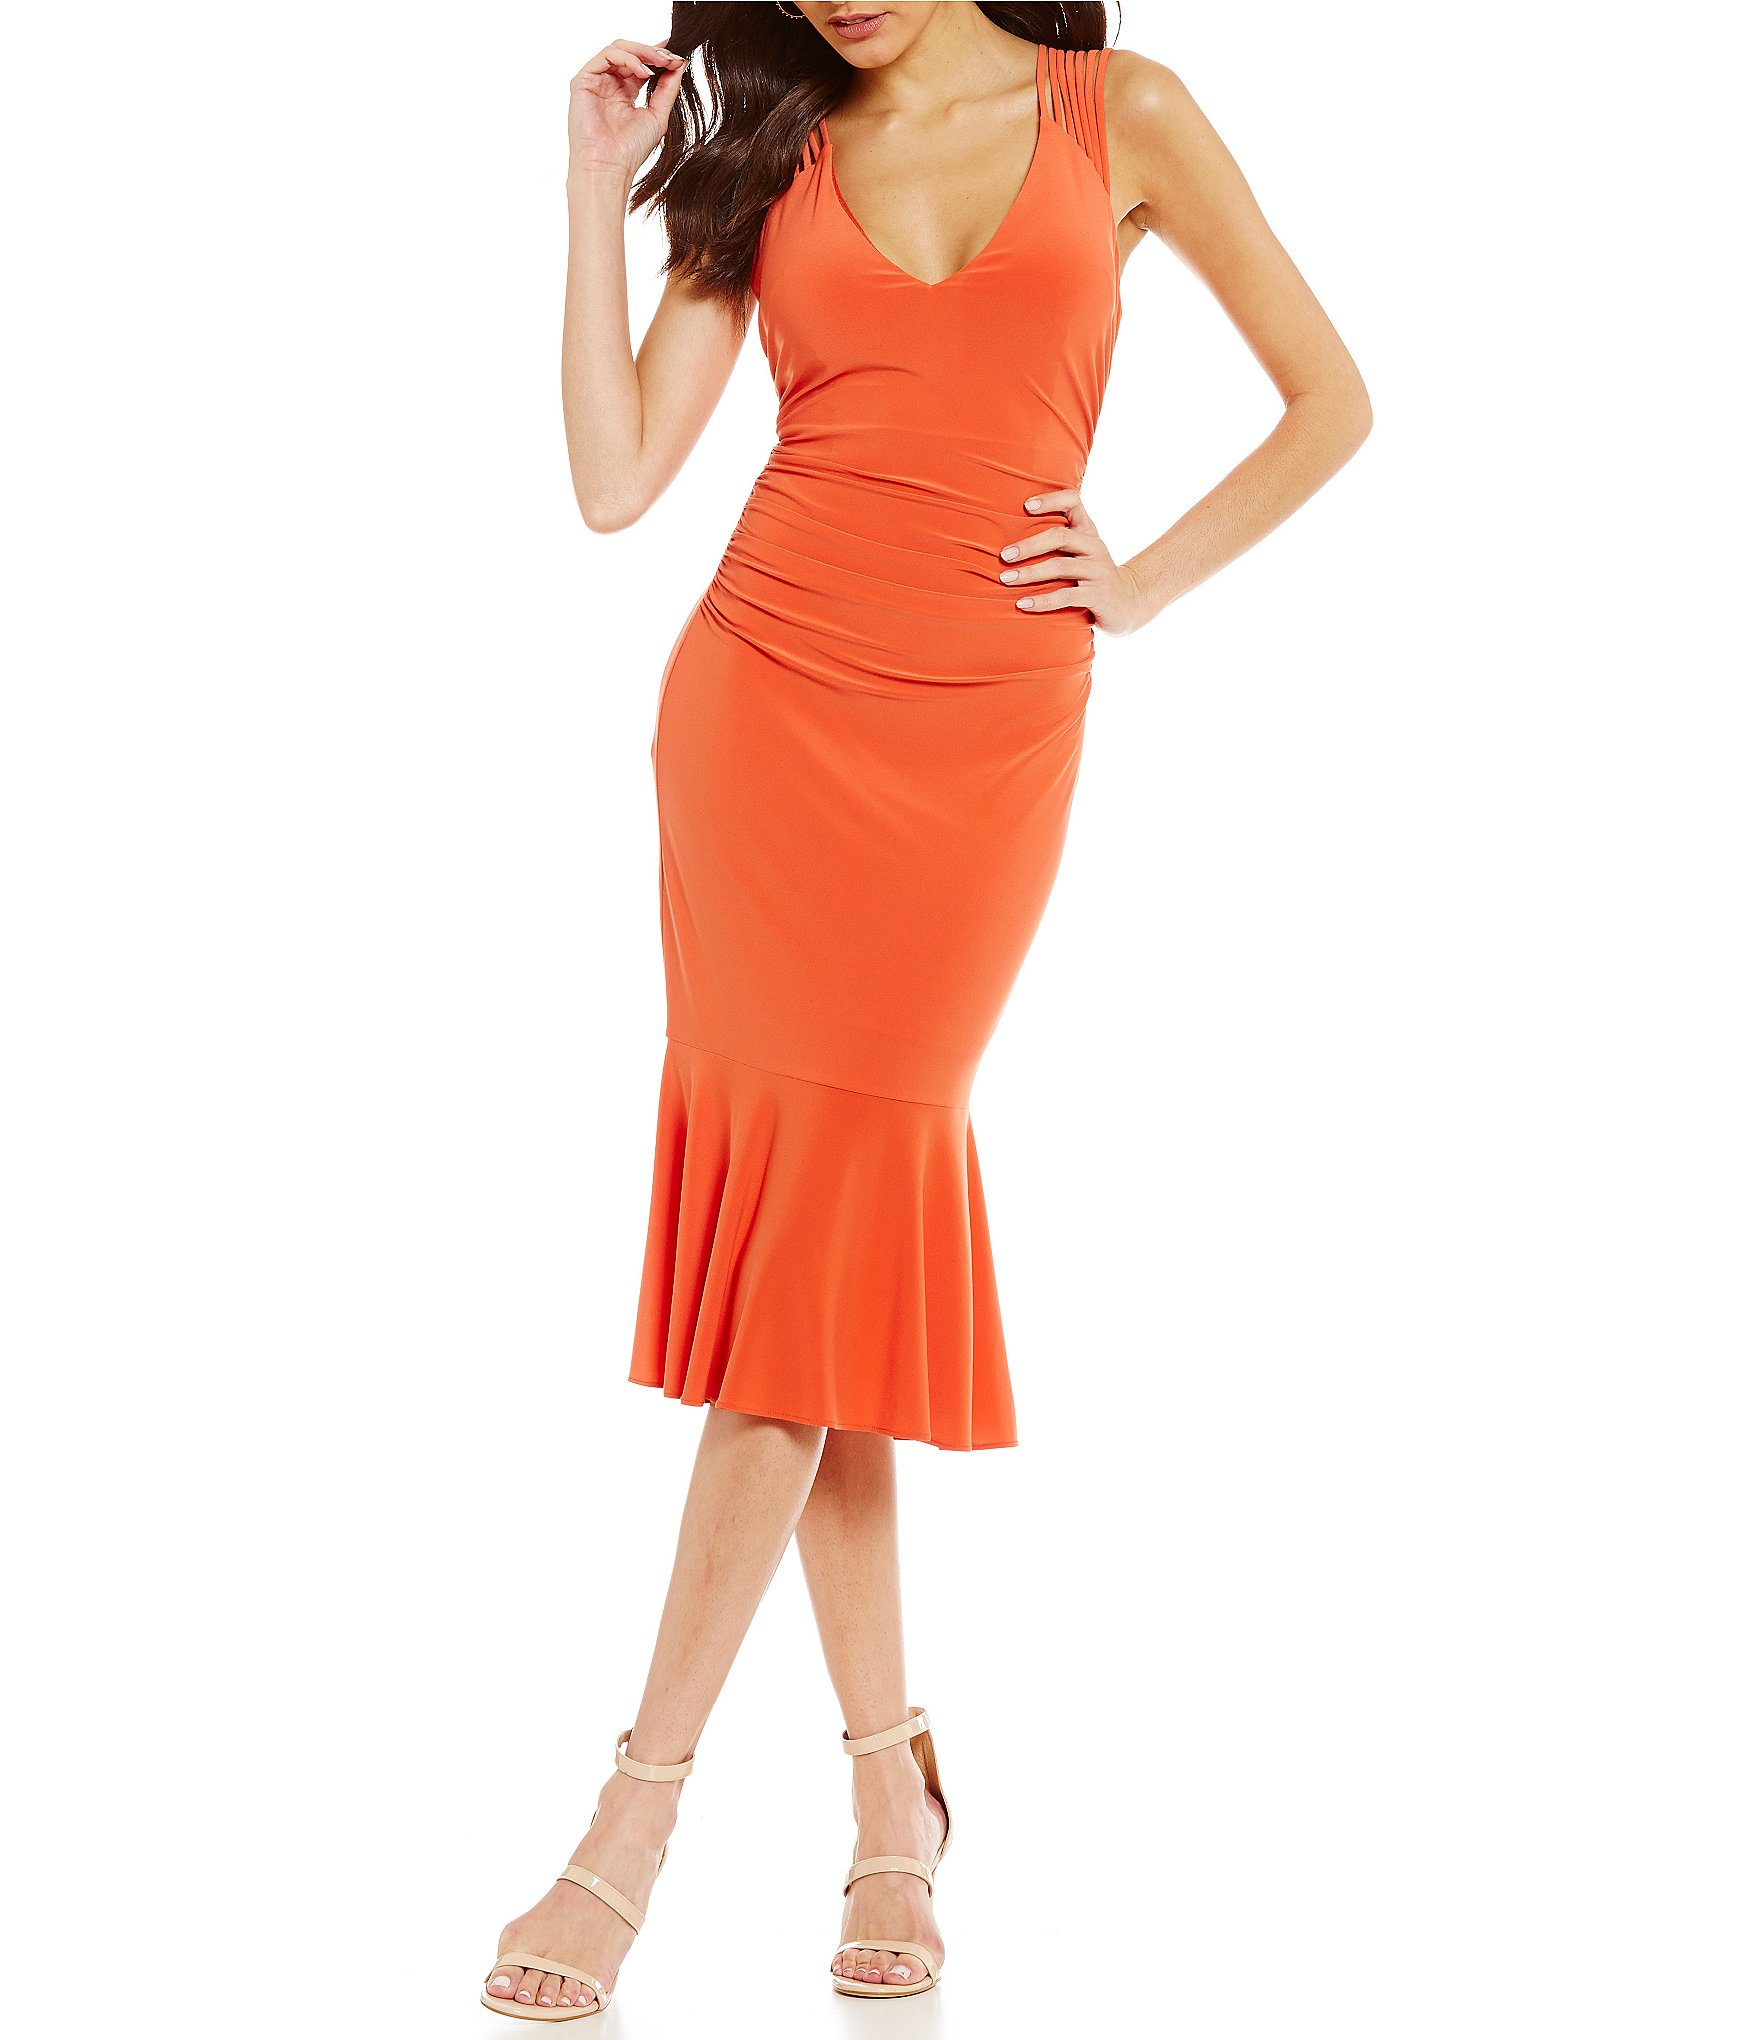 Women\'s Clothing | Dresses | Daytime | Mid-Length | Dillards.com